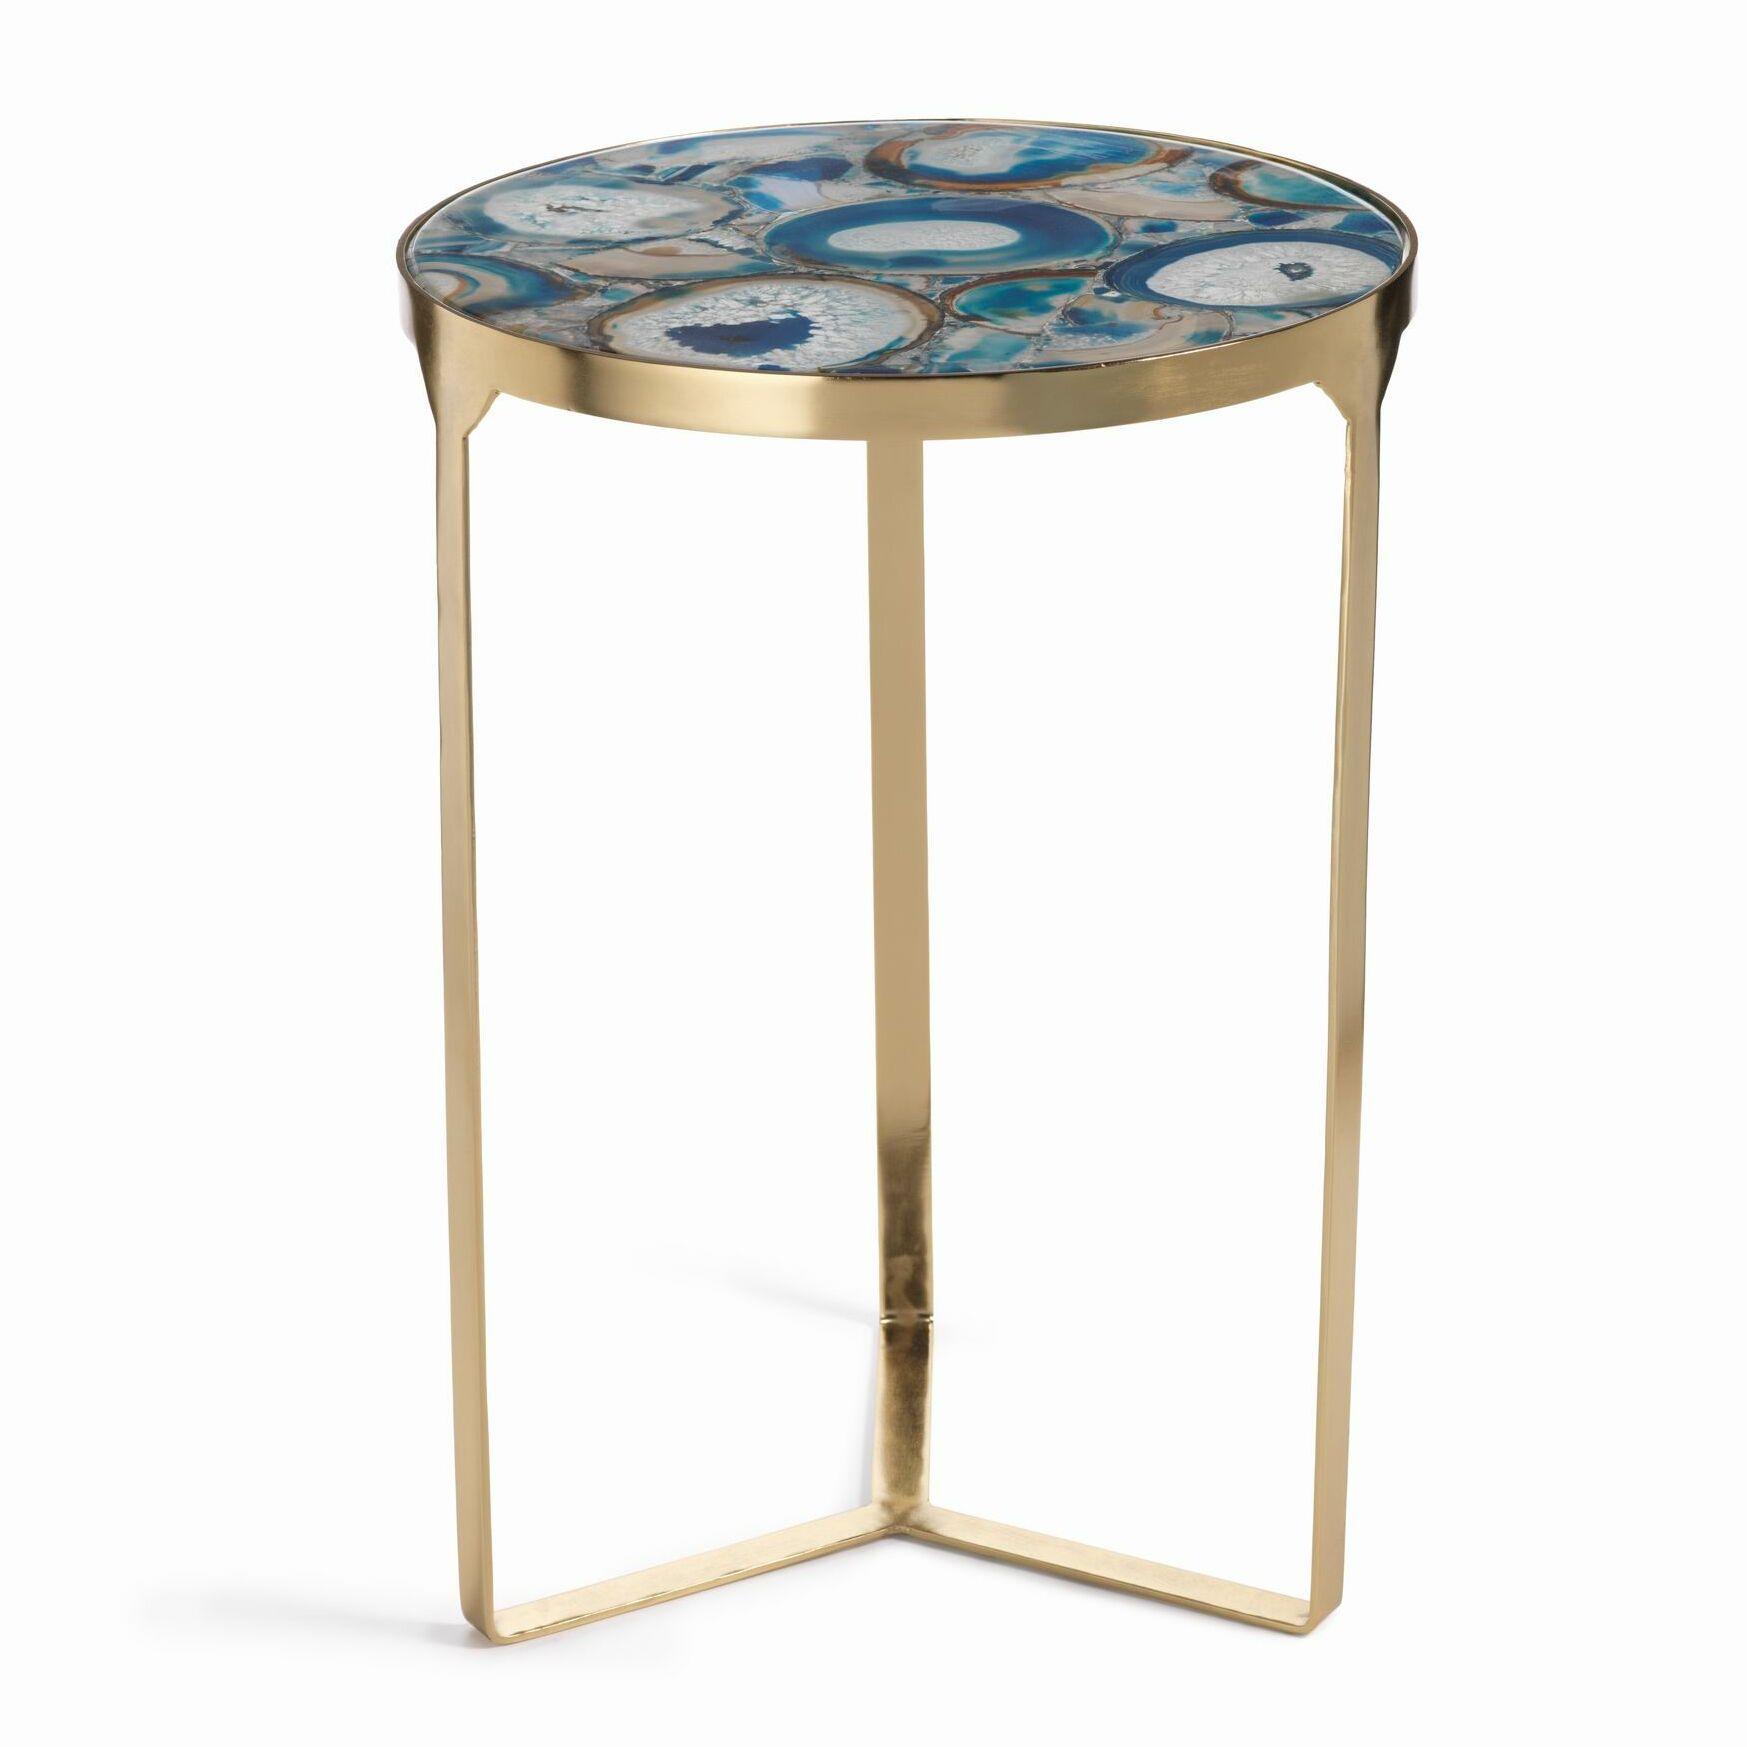 La Sardaigne 20-inch Tall Brass End Table